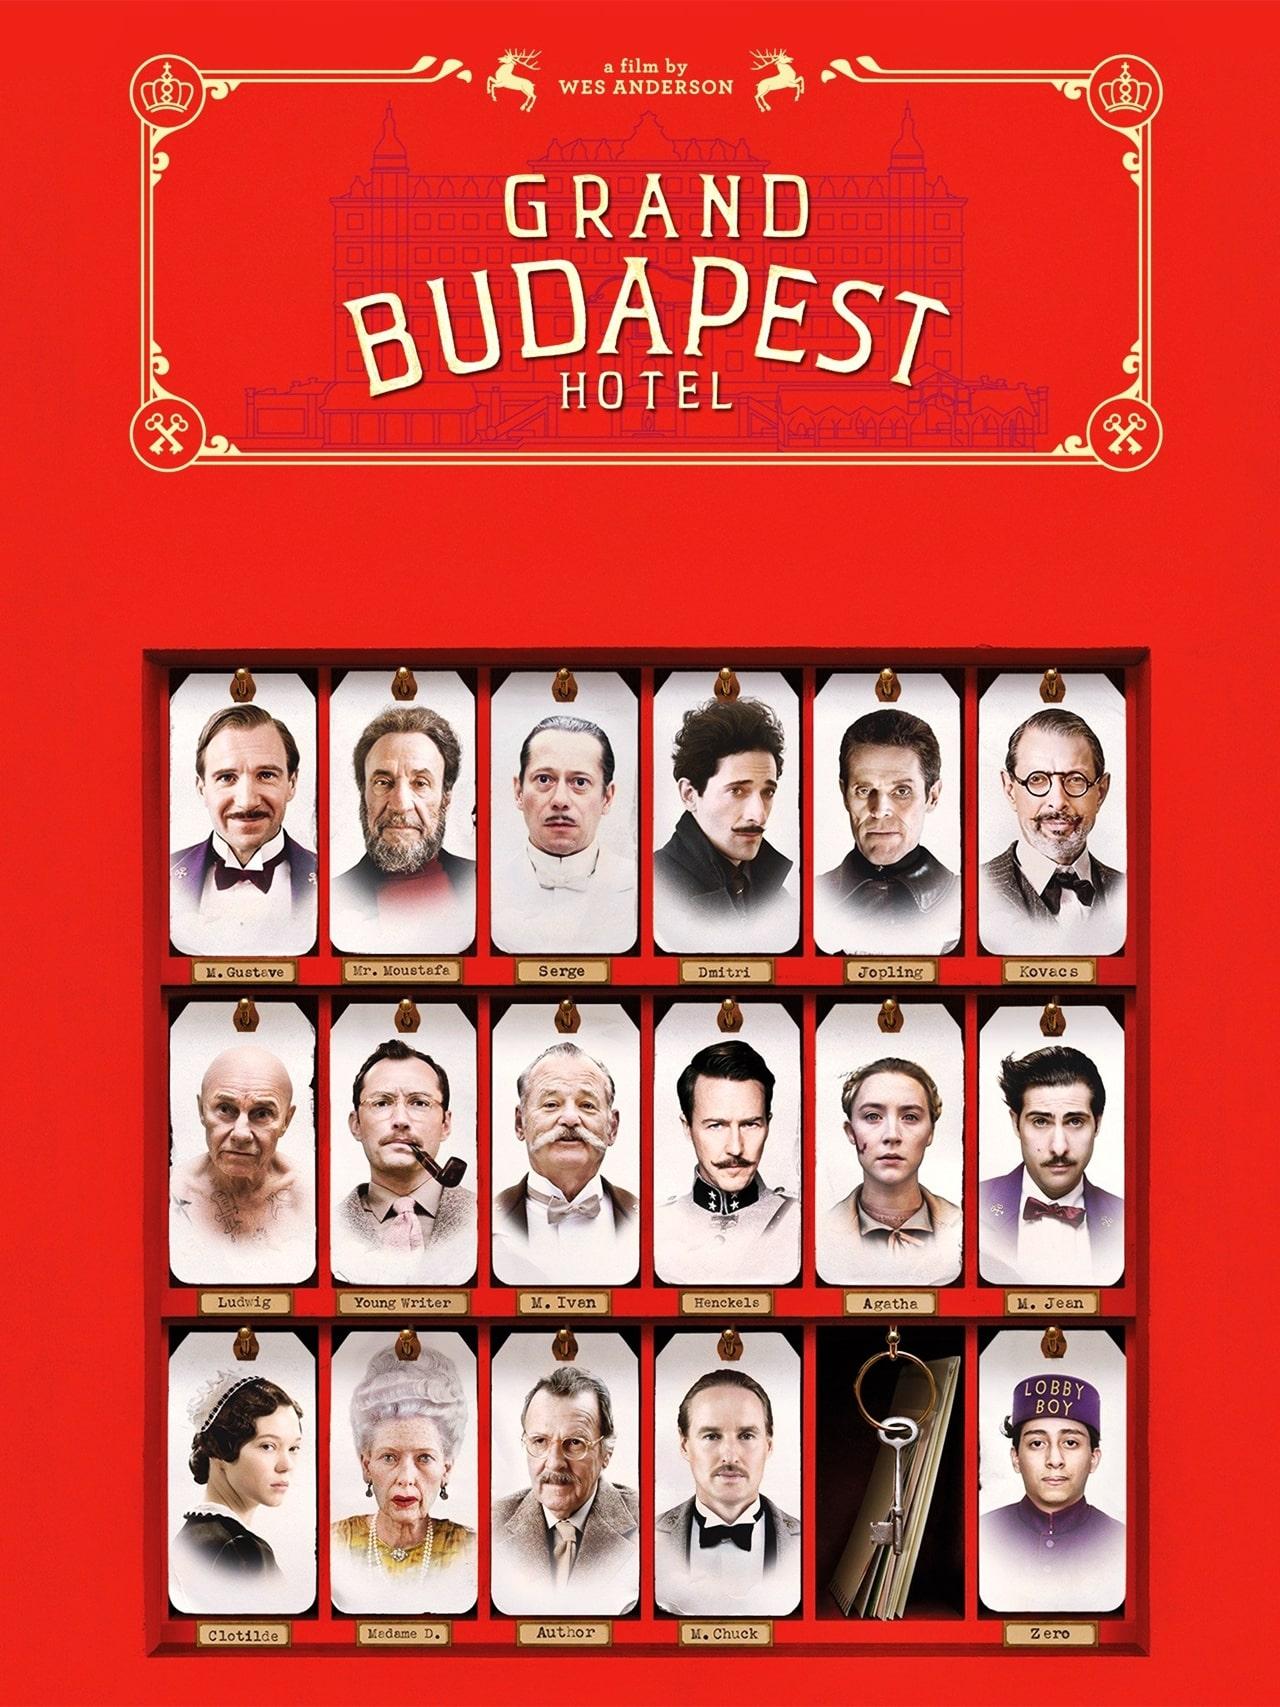 Review Filem : The Grand Budapest Hotel (2014), Filem Terbaik Karya Wes Anderson